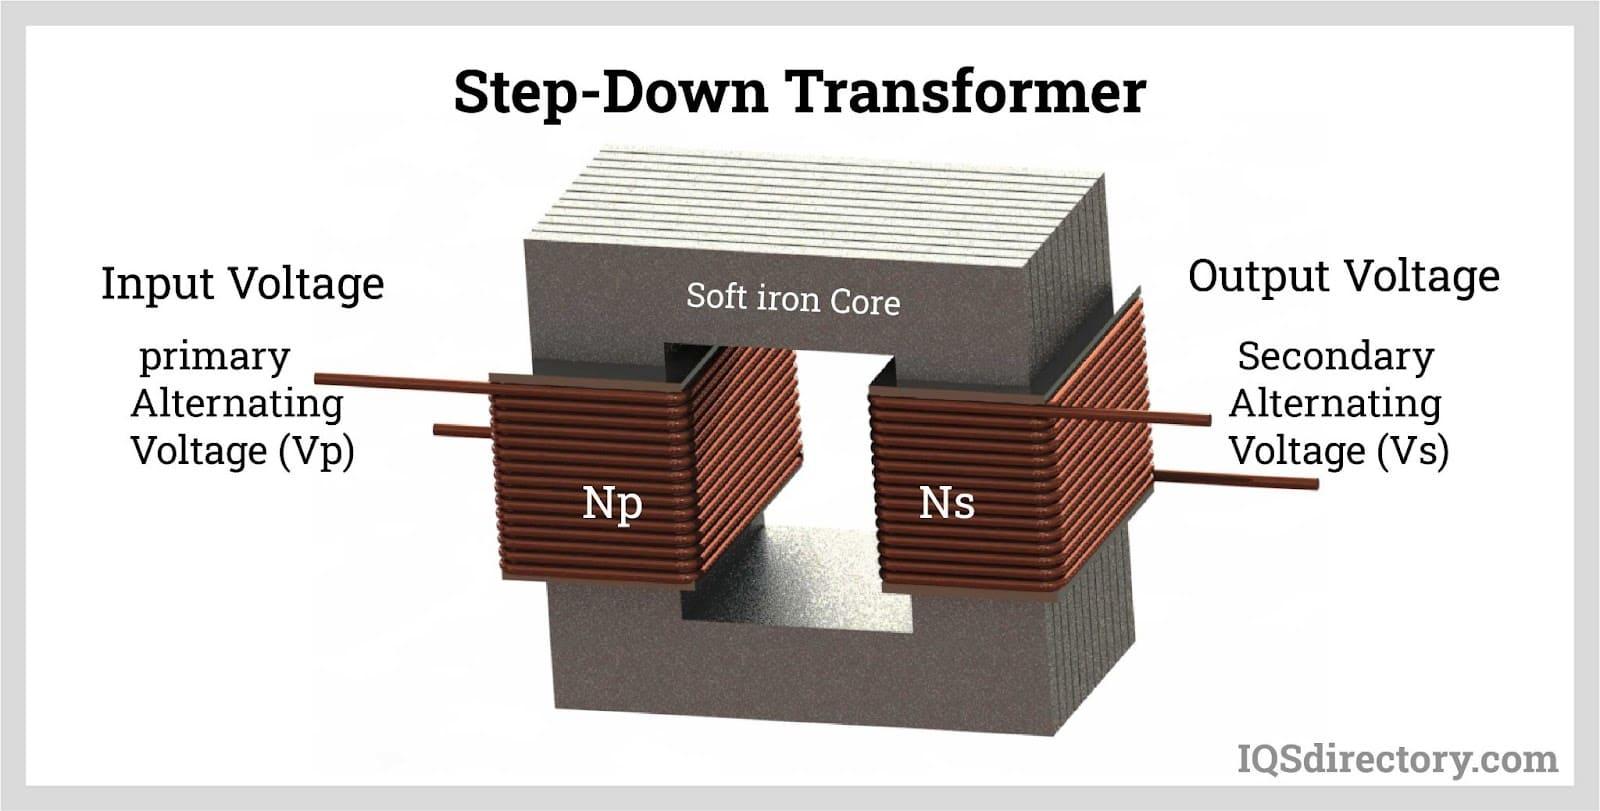 Step-Down Transformer